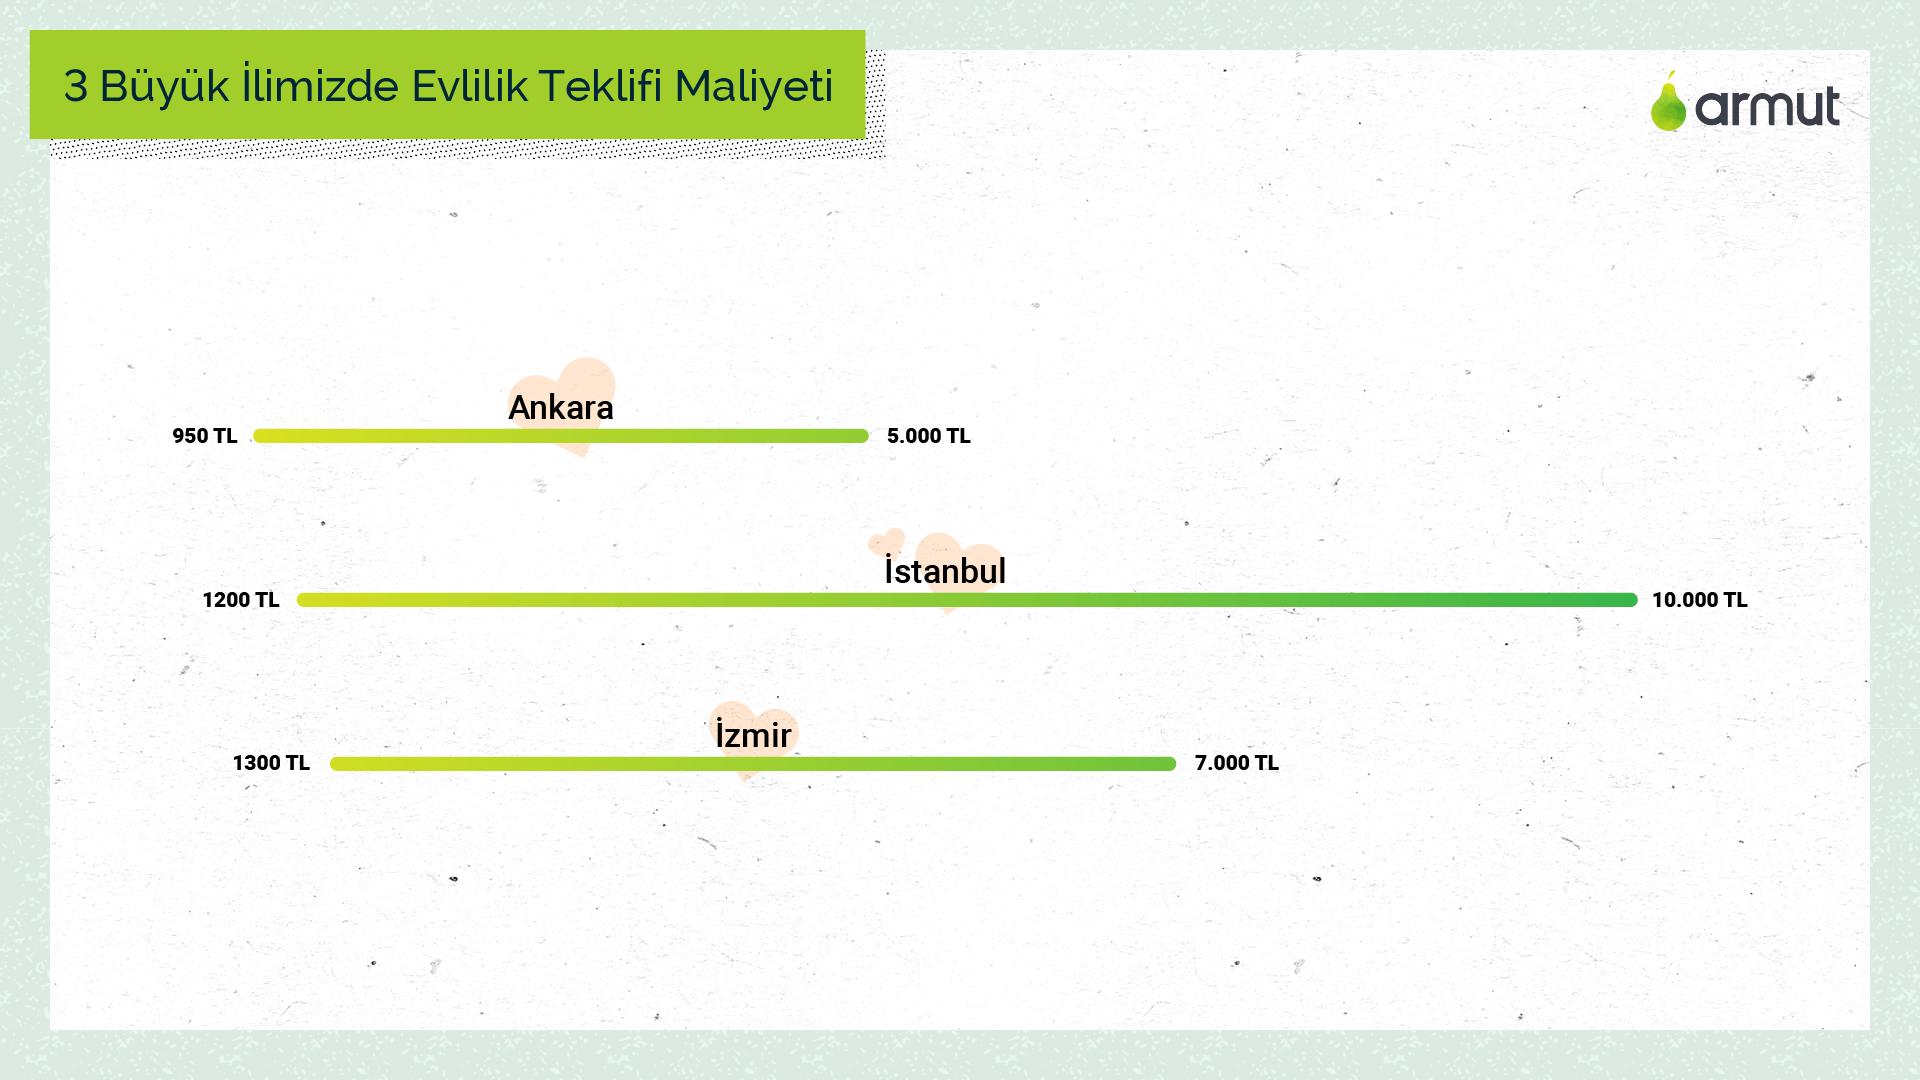 armut_evlilik_teklifi_maliyet_istanbul_ankara_izmir